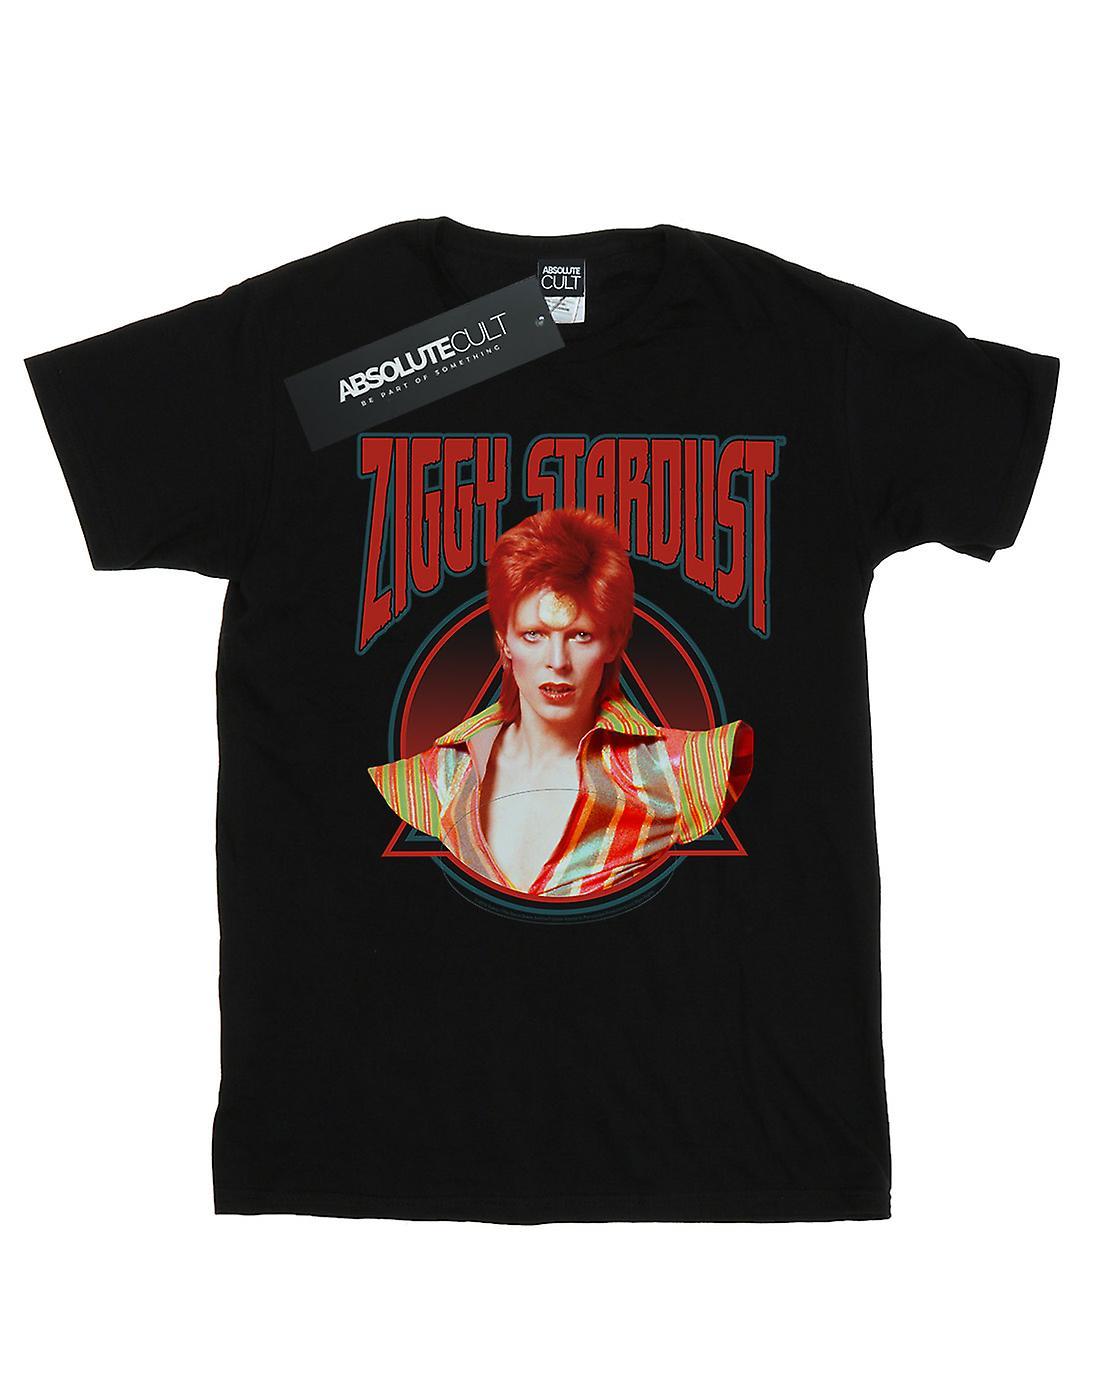 David Bowie Men's Ziggy Stardust T-Shirt